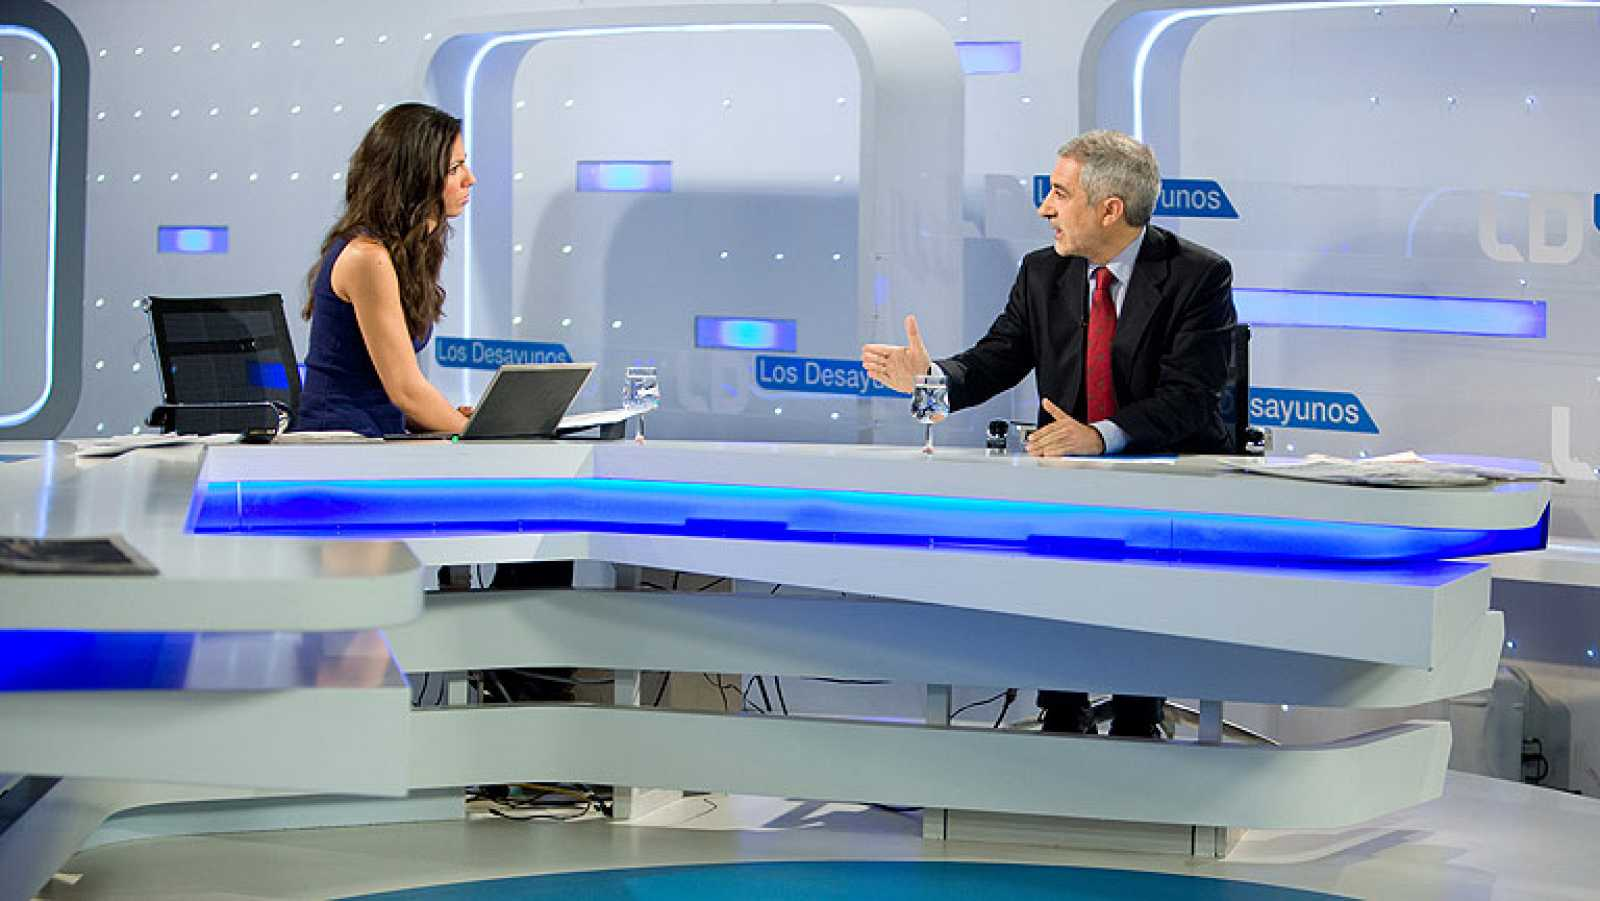 Entrevista íntegra al diputado de IU Gaspar Llamazares